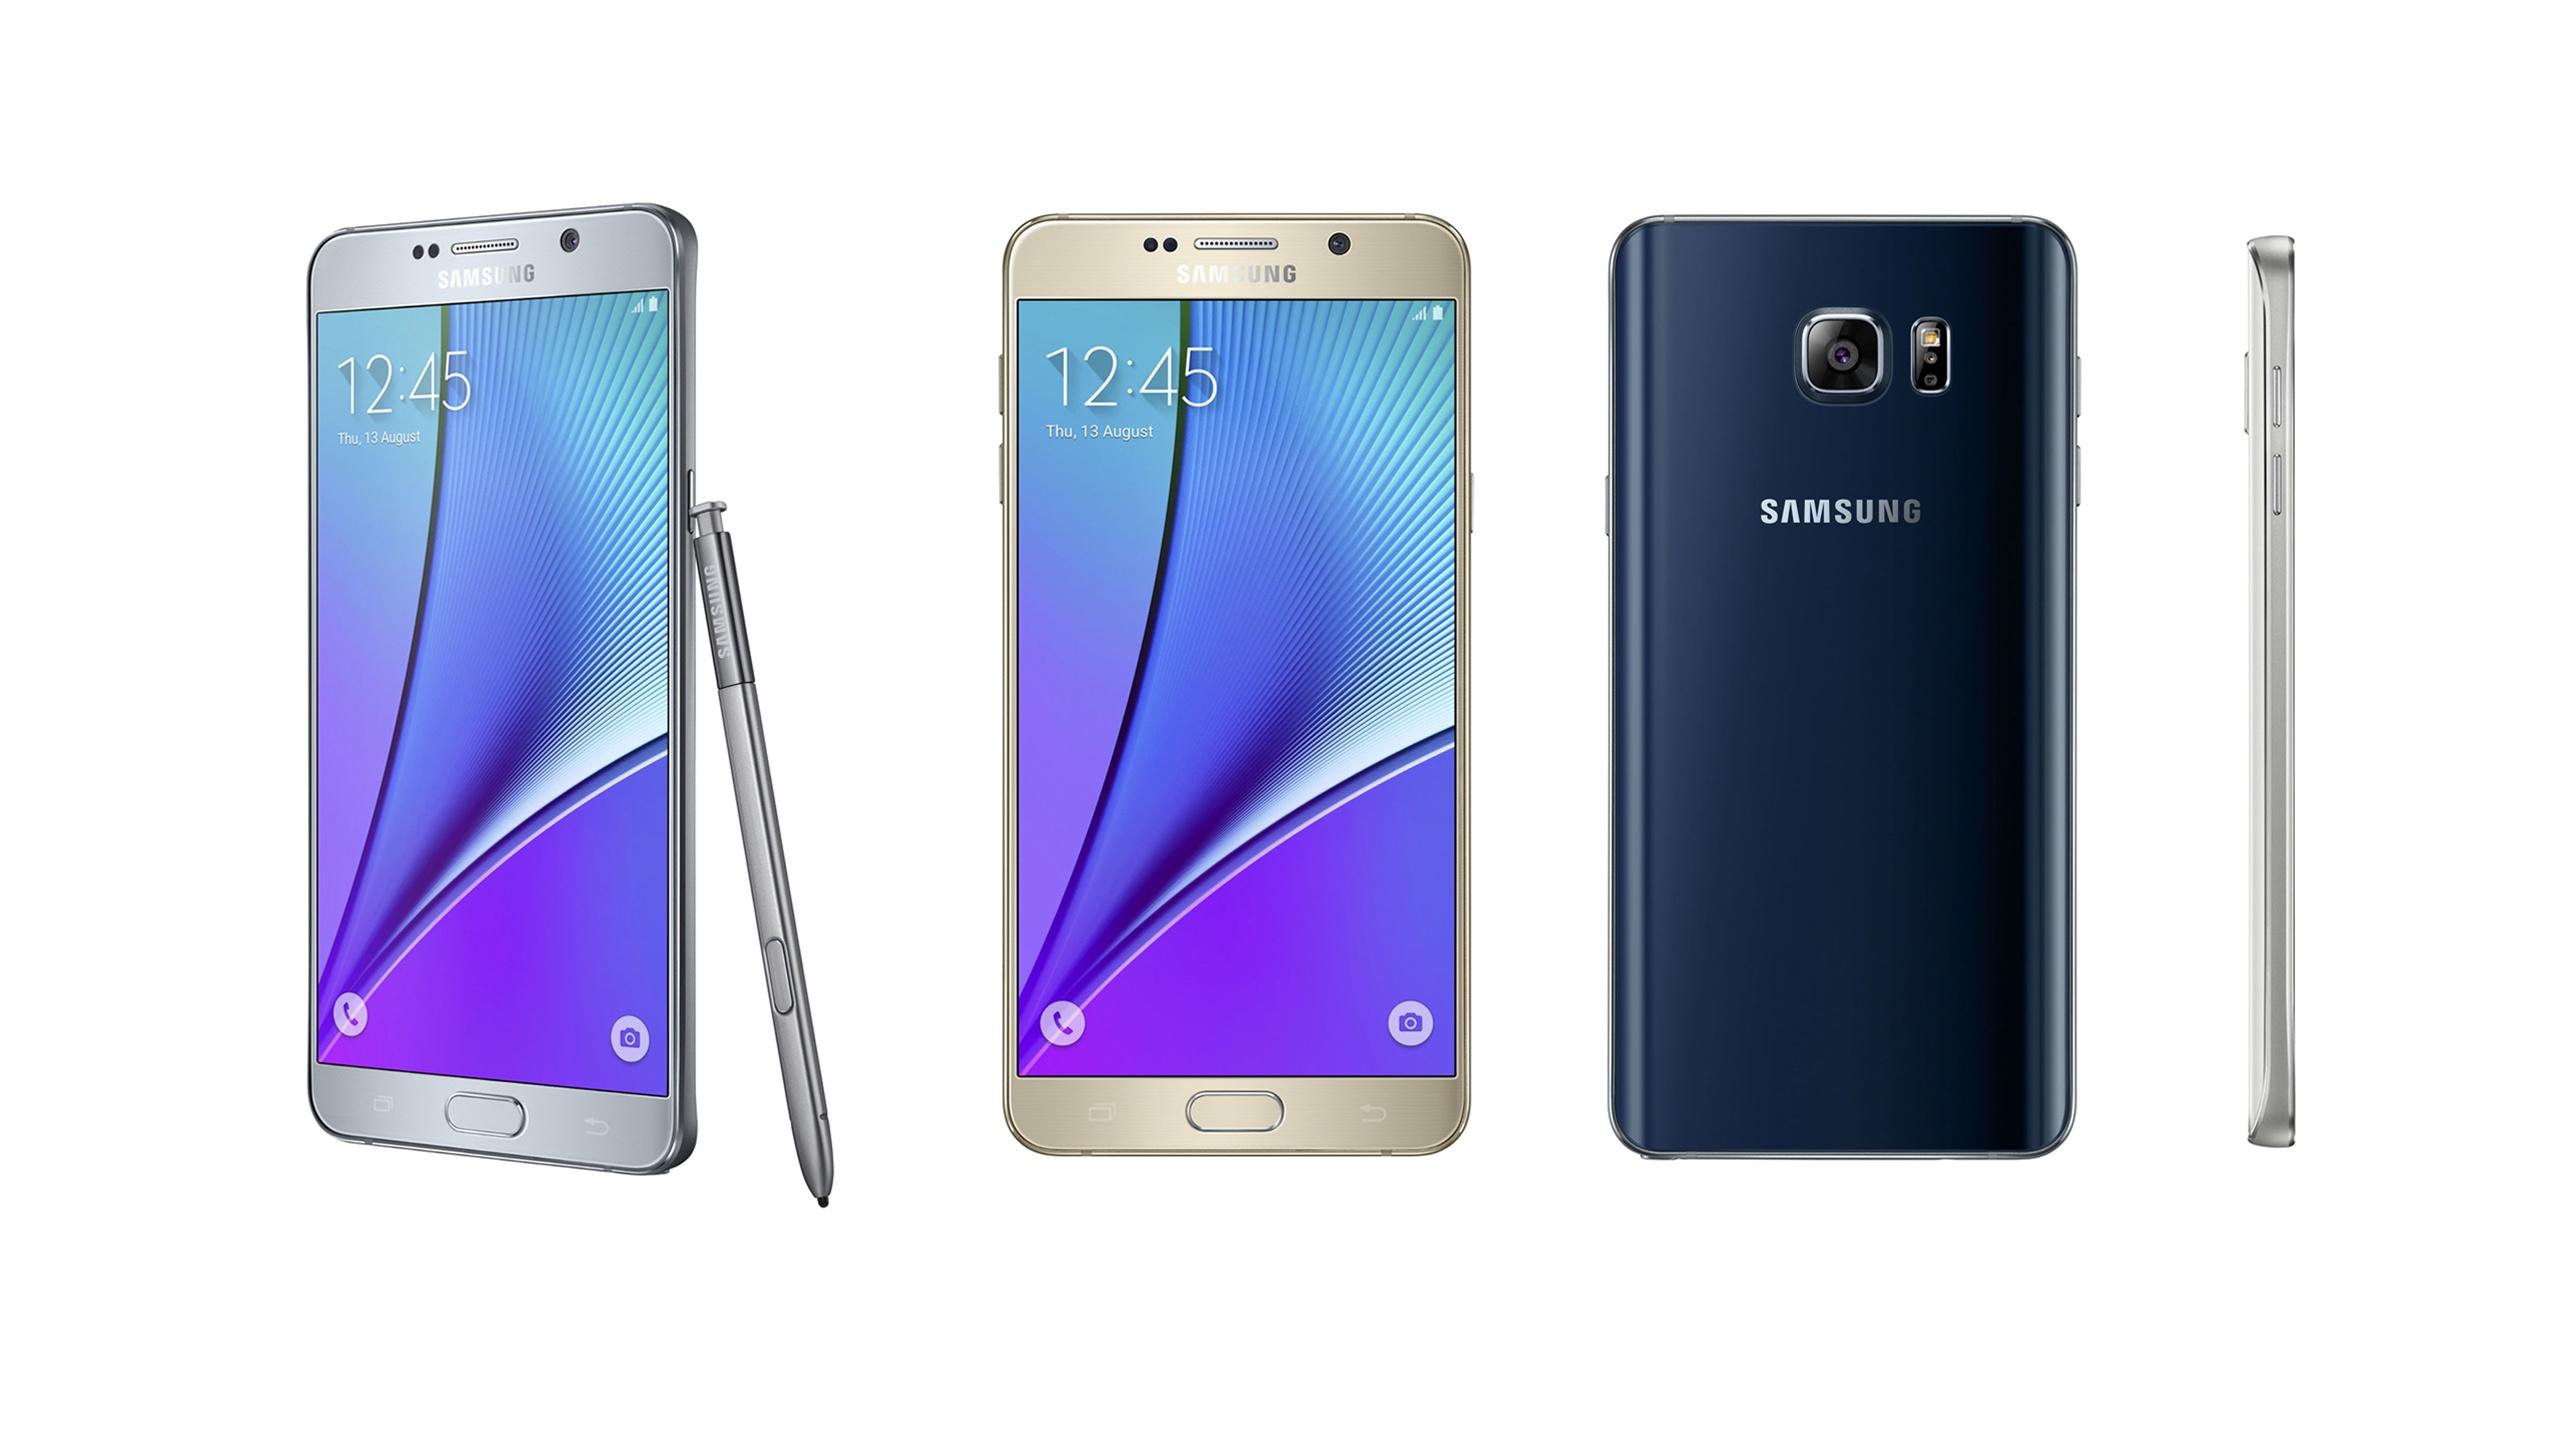 Samsung Galaxy Note 5 HD Wallpaper   iHD Wallpapers 2560x1440